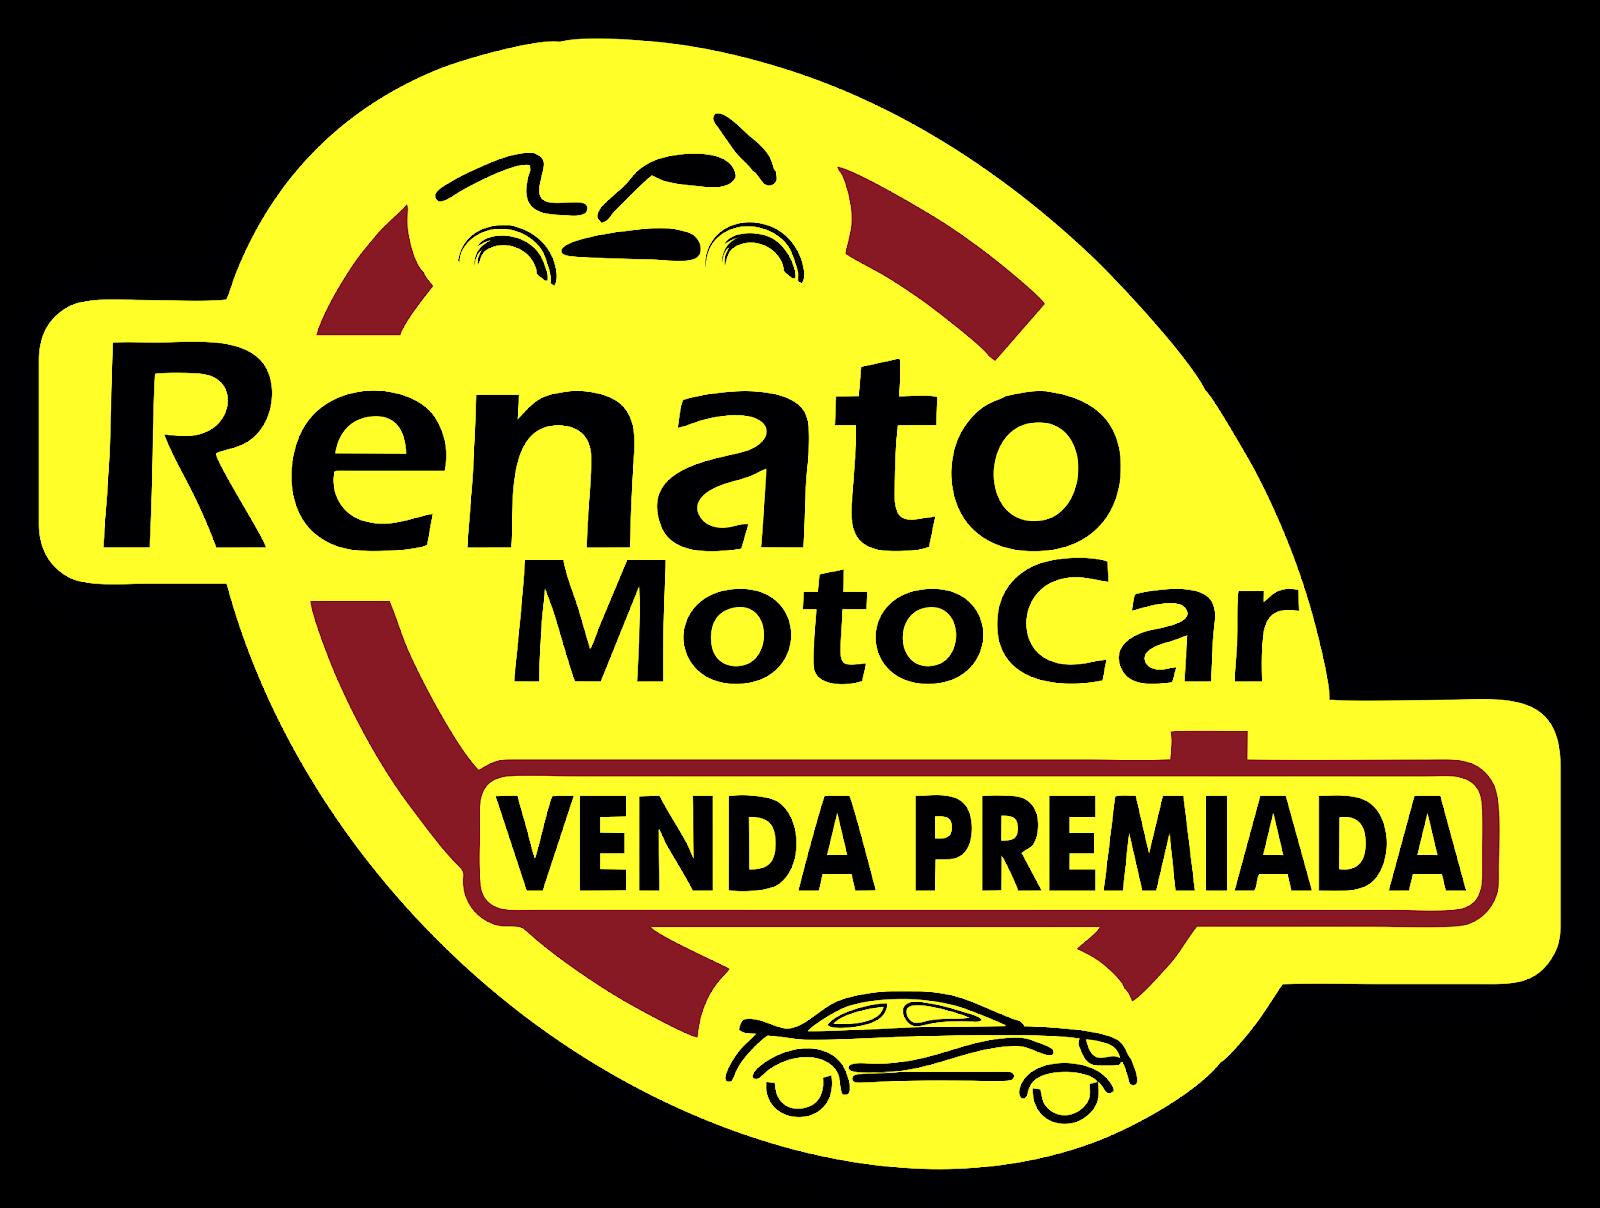 Renato MotoCar